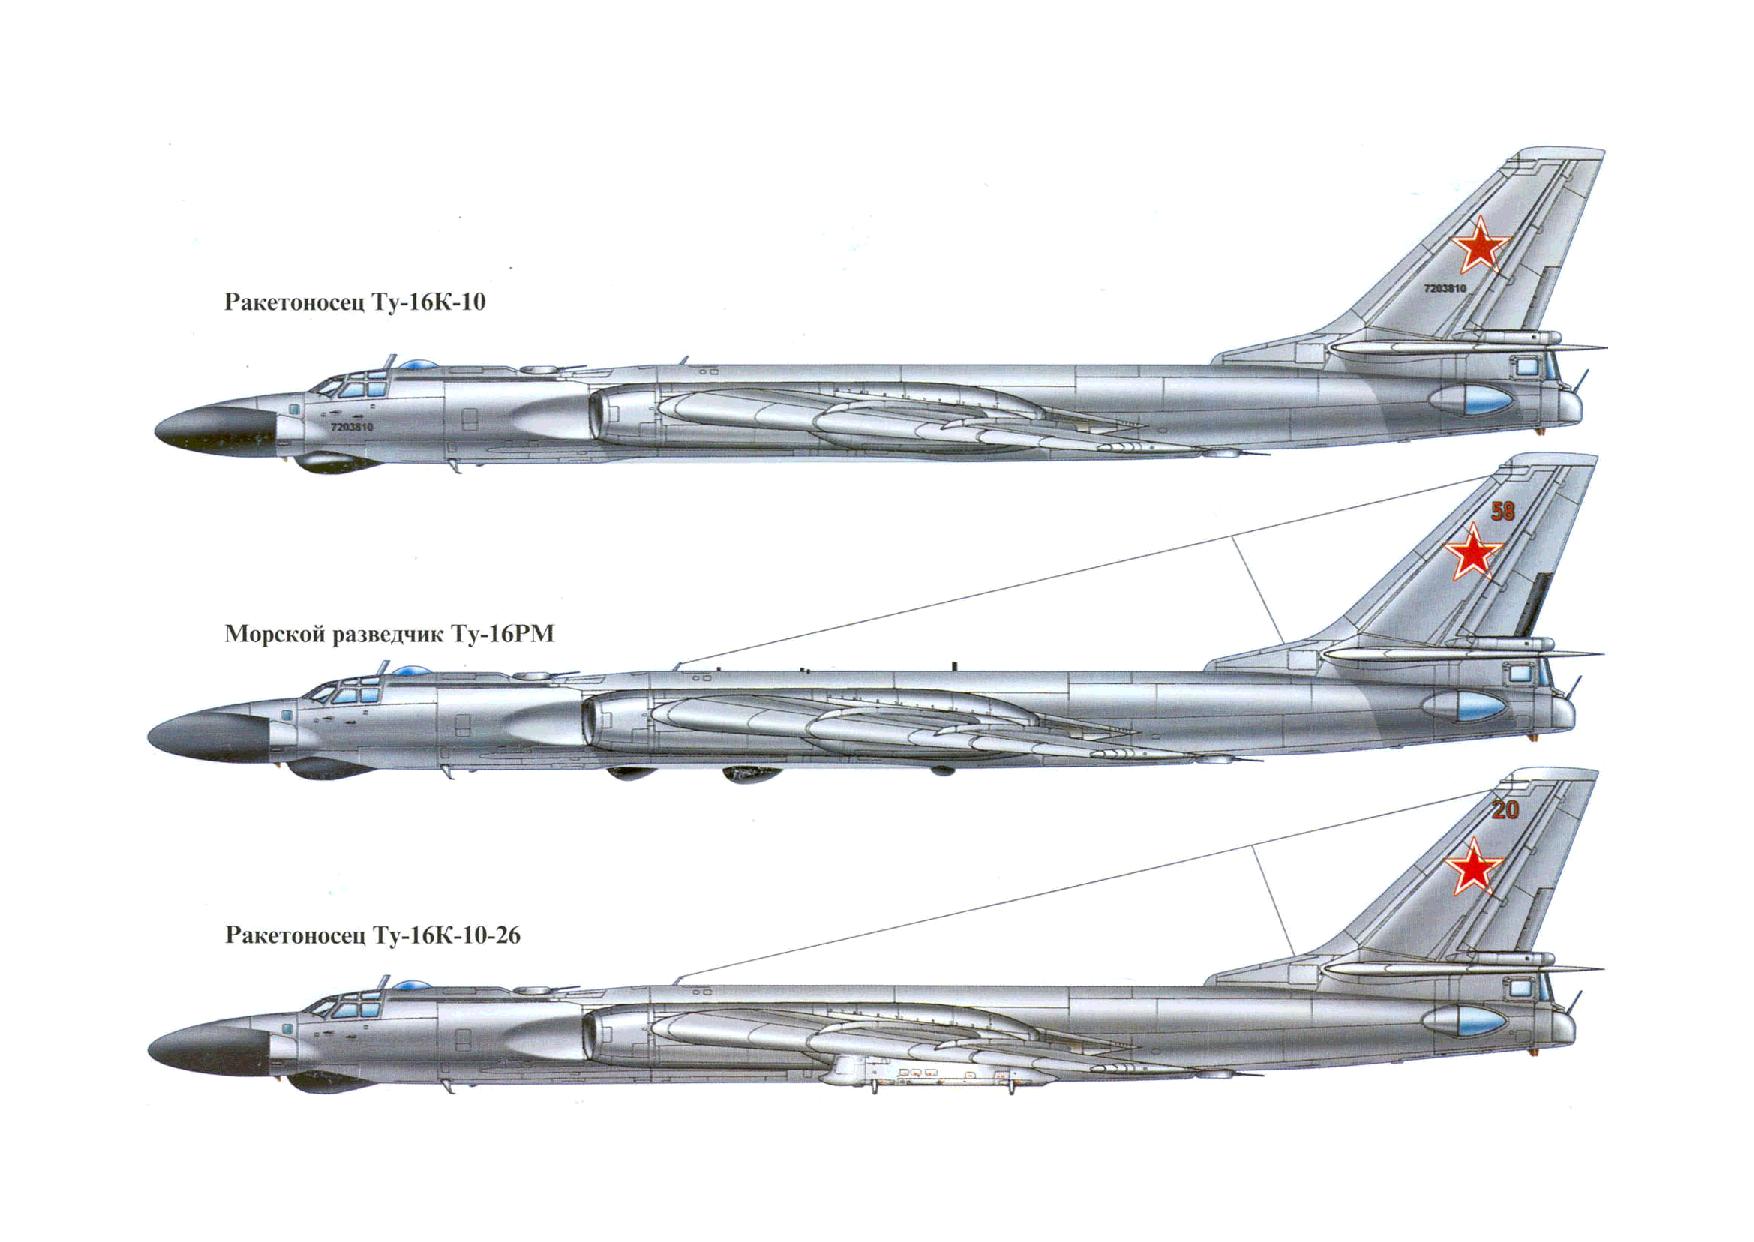 История создания и характеристики бомбардировщика ту-22м3